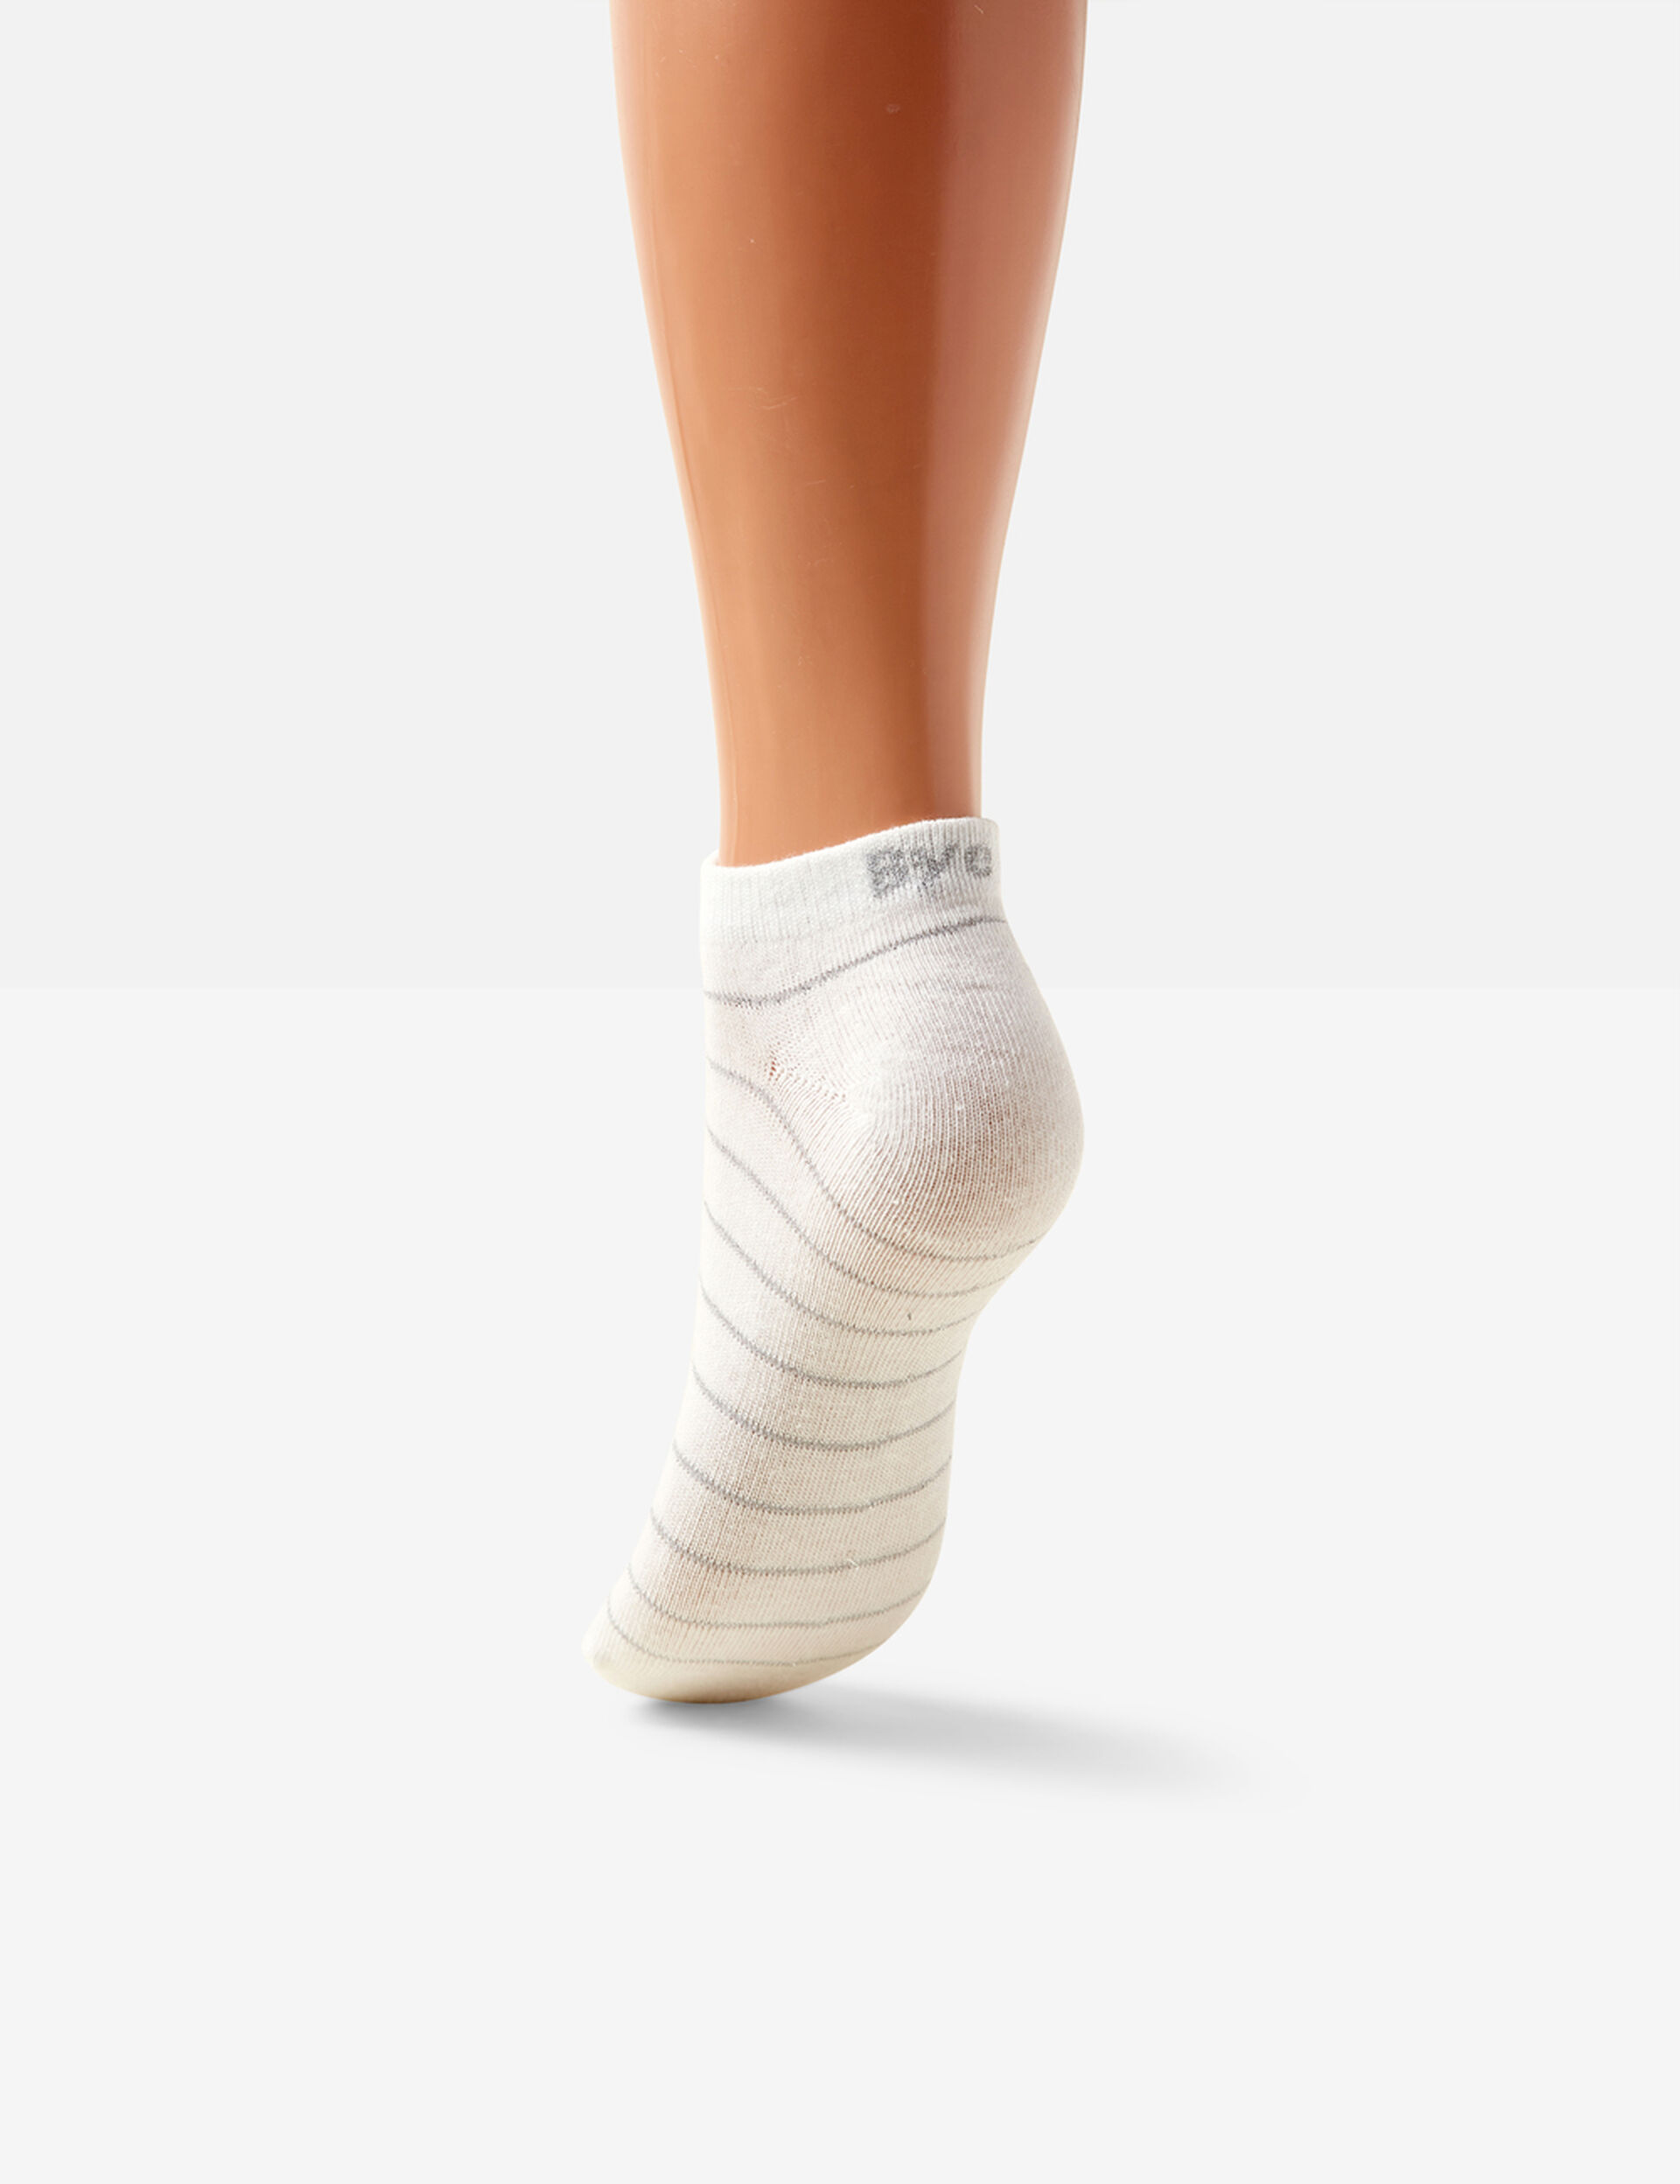 White, grey and charcoal lurex socks